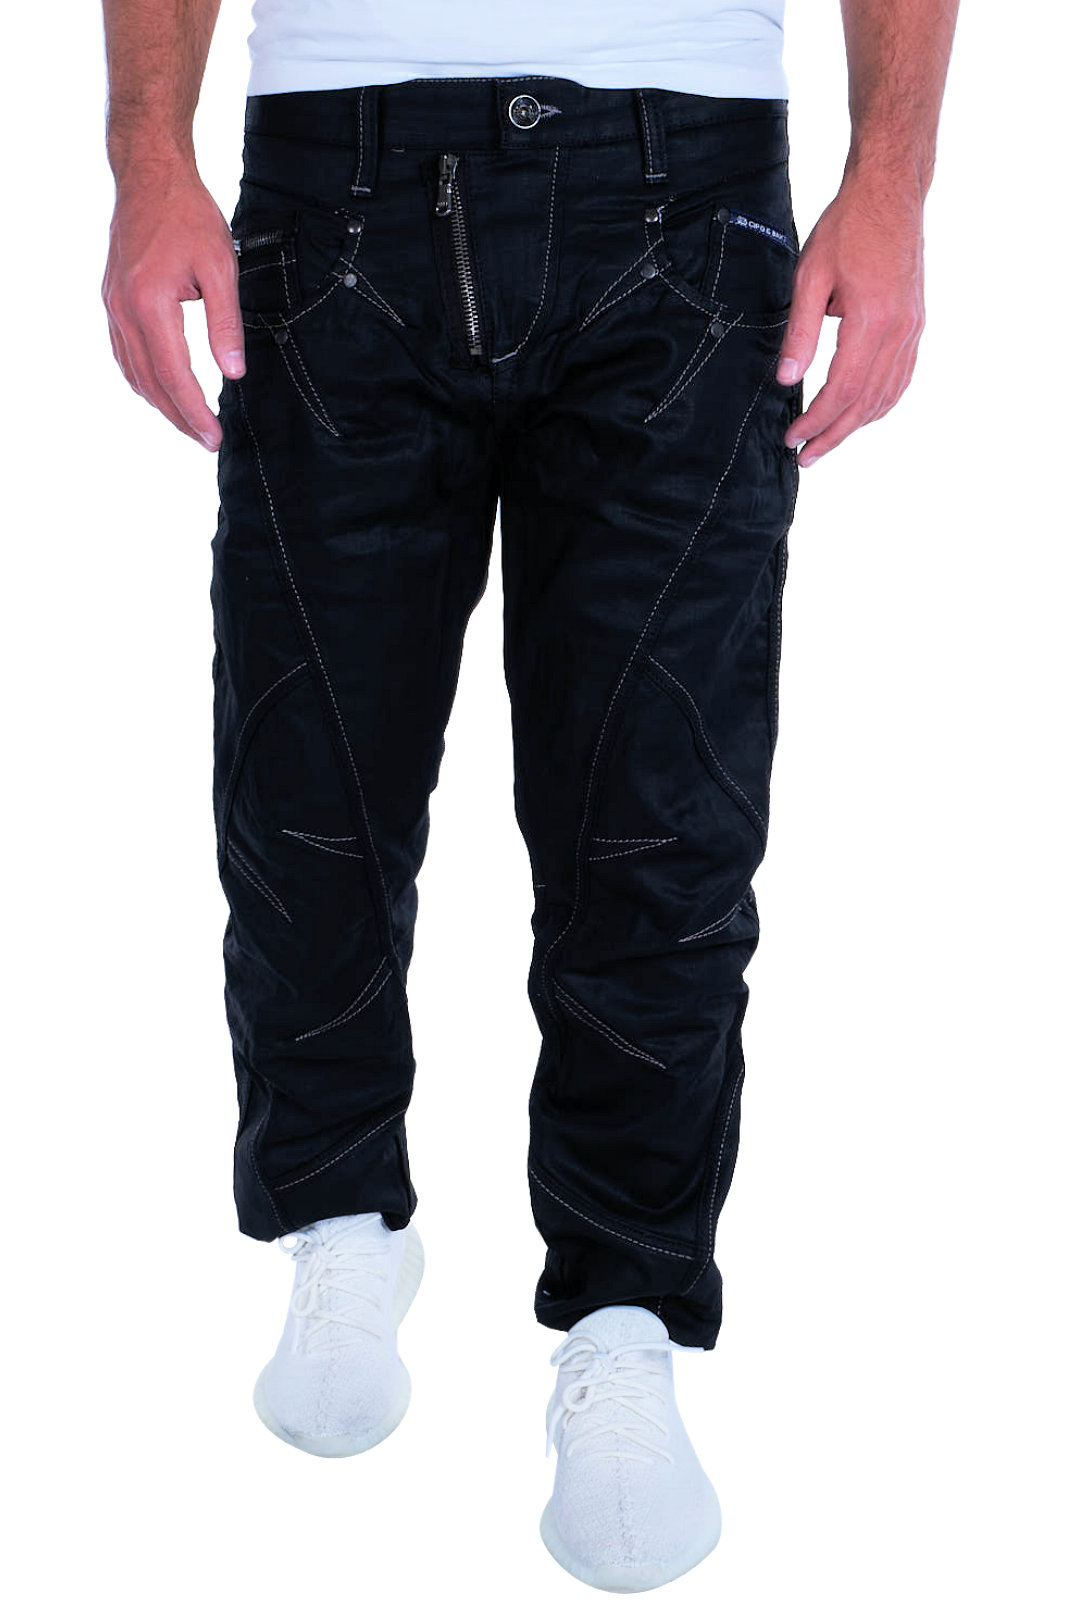 Nähte Jeans Clubwear Herren amp; Hose C 0812 Cipo C Dicke Denim Neu Bestseller Baxx Uwqvwxt